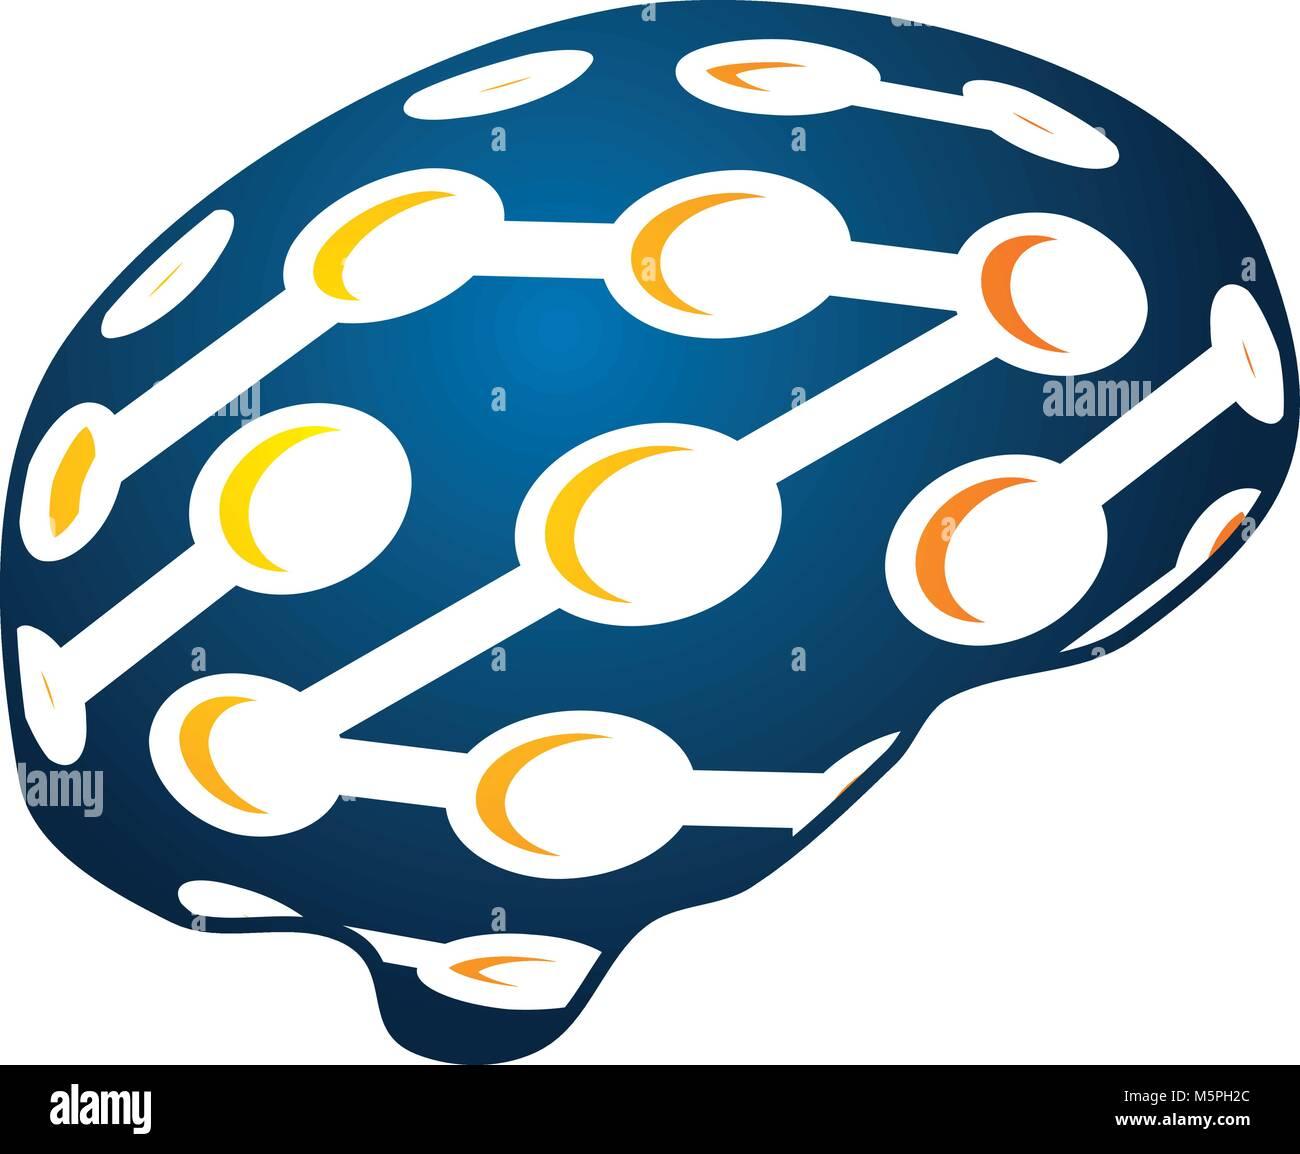 neuroscience Logo Design Template Vector - Stock Image